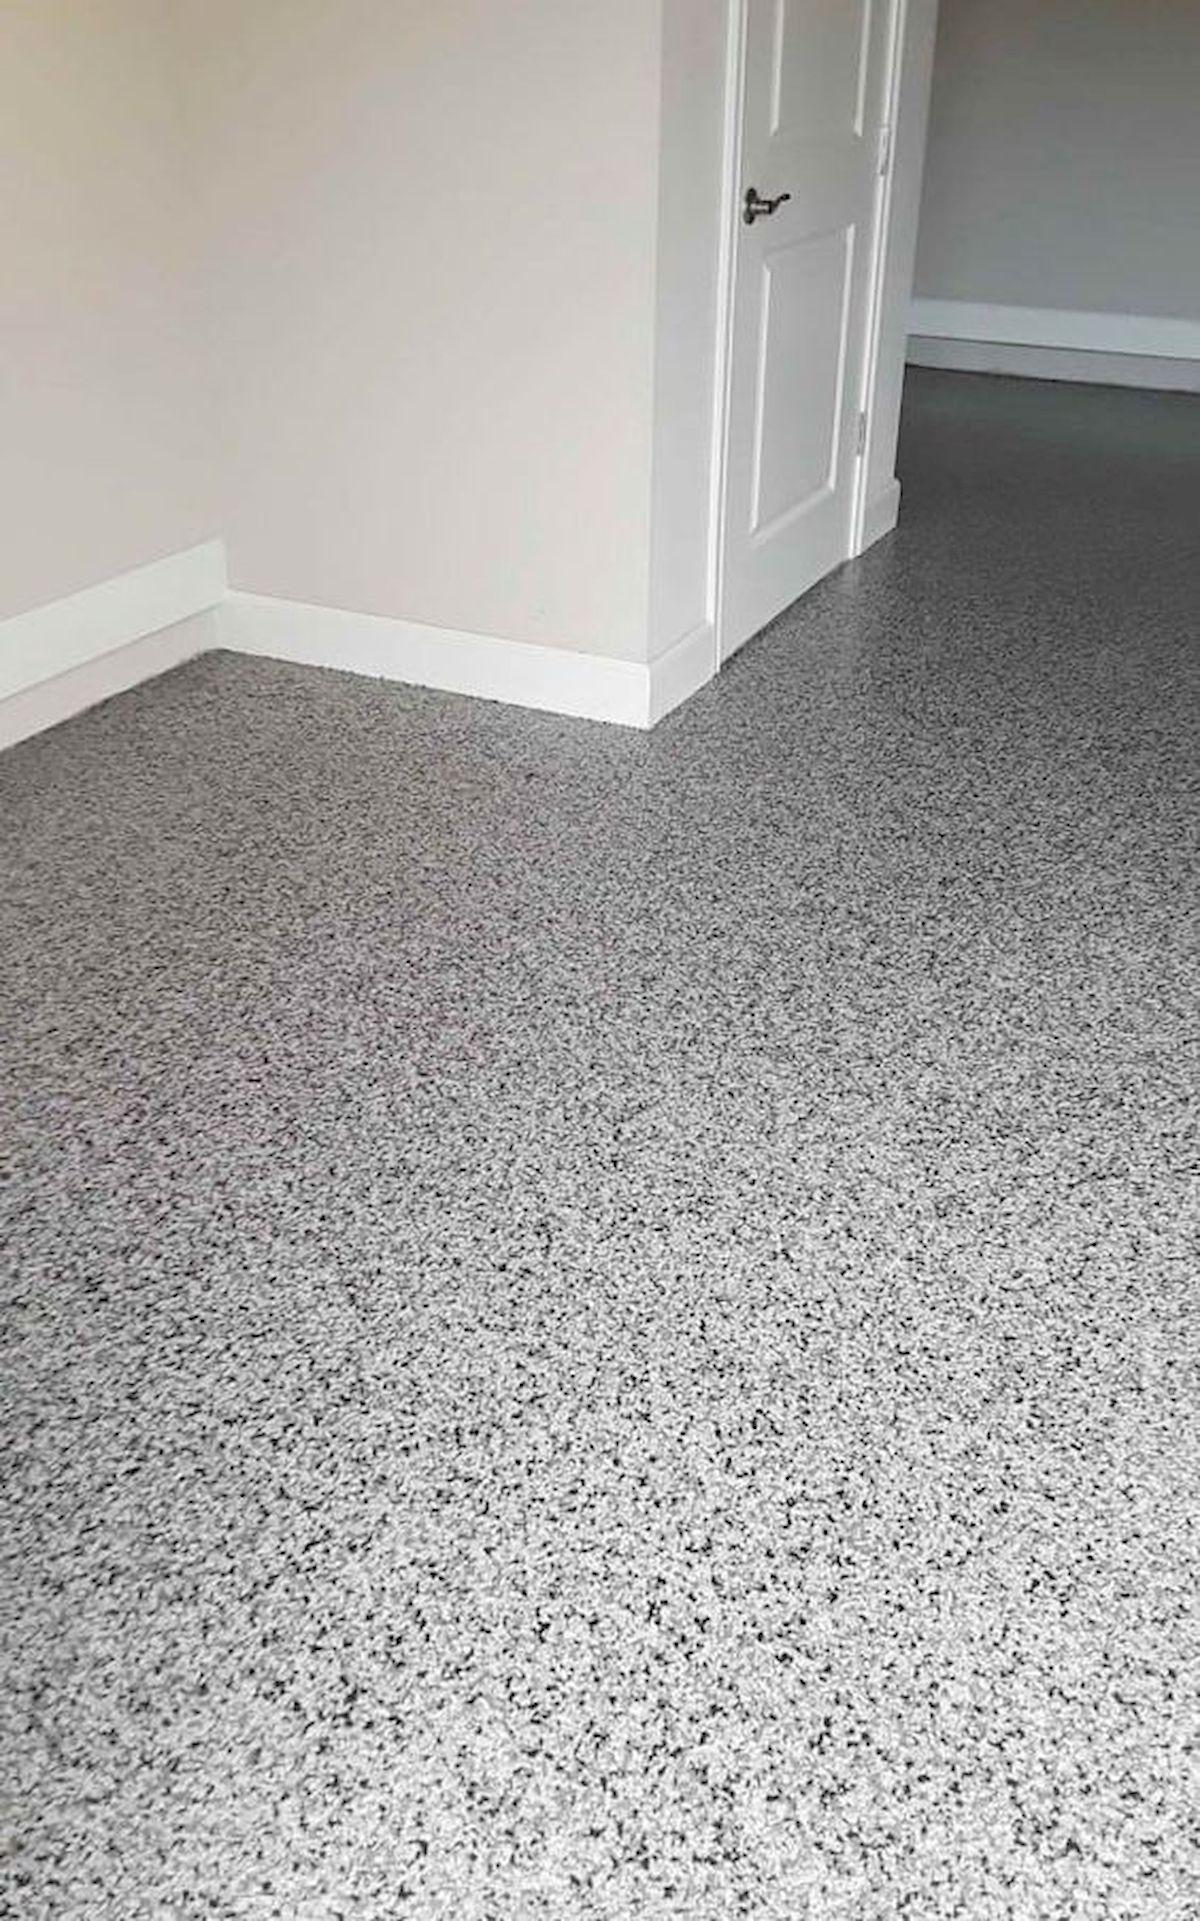 70 Smooth Concrete Floor Ideas For Interior Home (3)